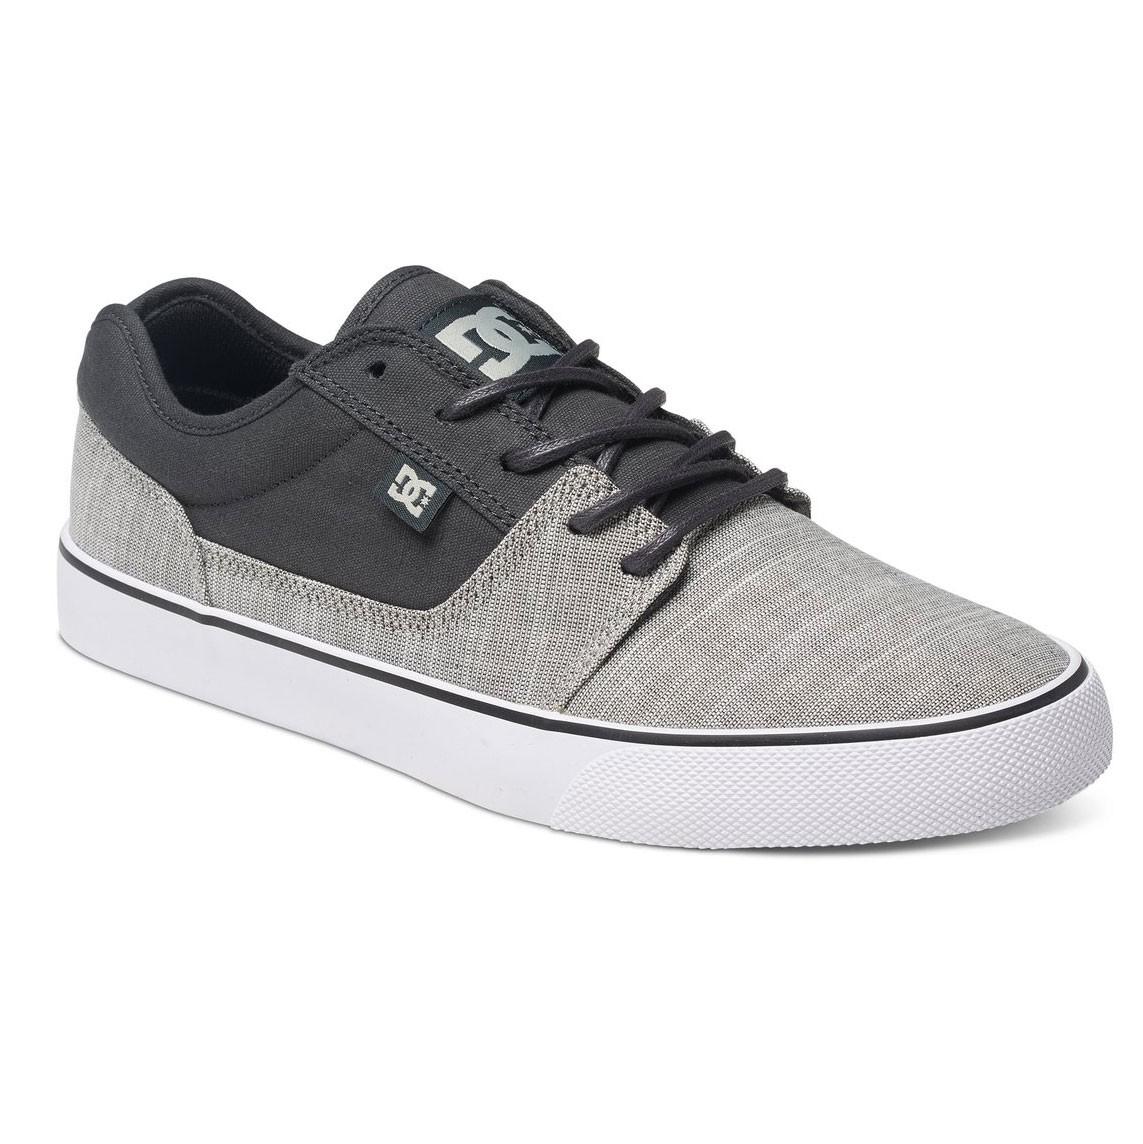 Tenisky DC Tonik TX SE charcoal grey